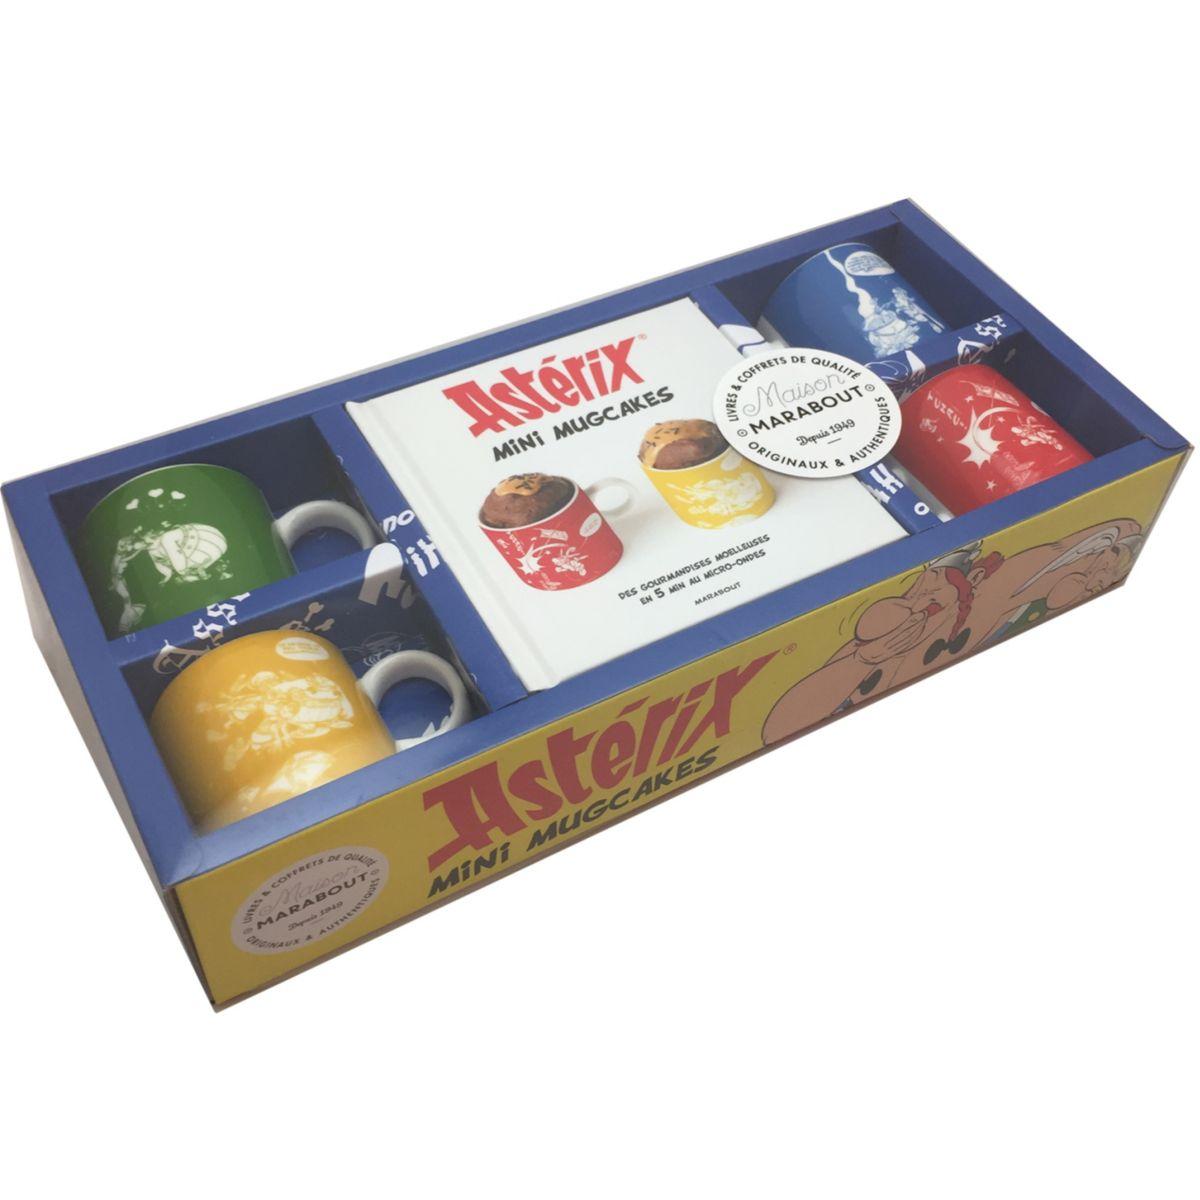 Coffret MARABOUT Mini mug cakes Astérix (photo)